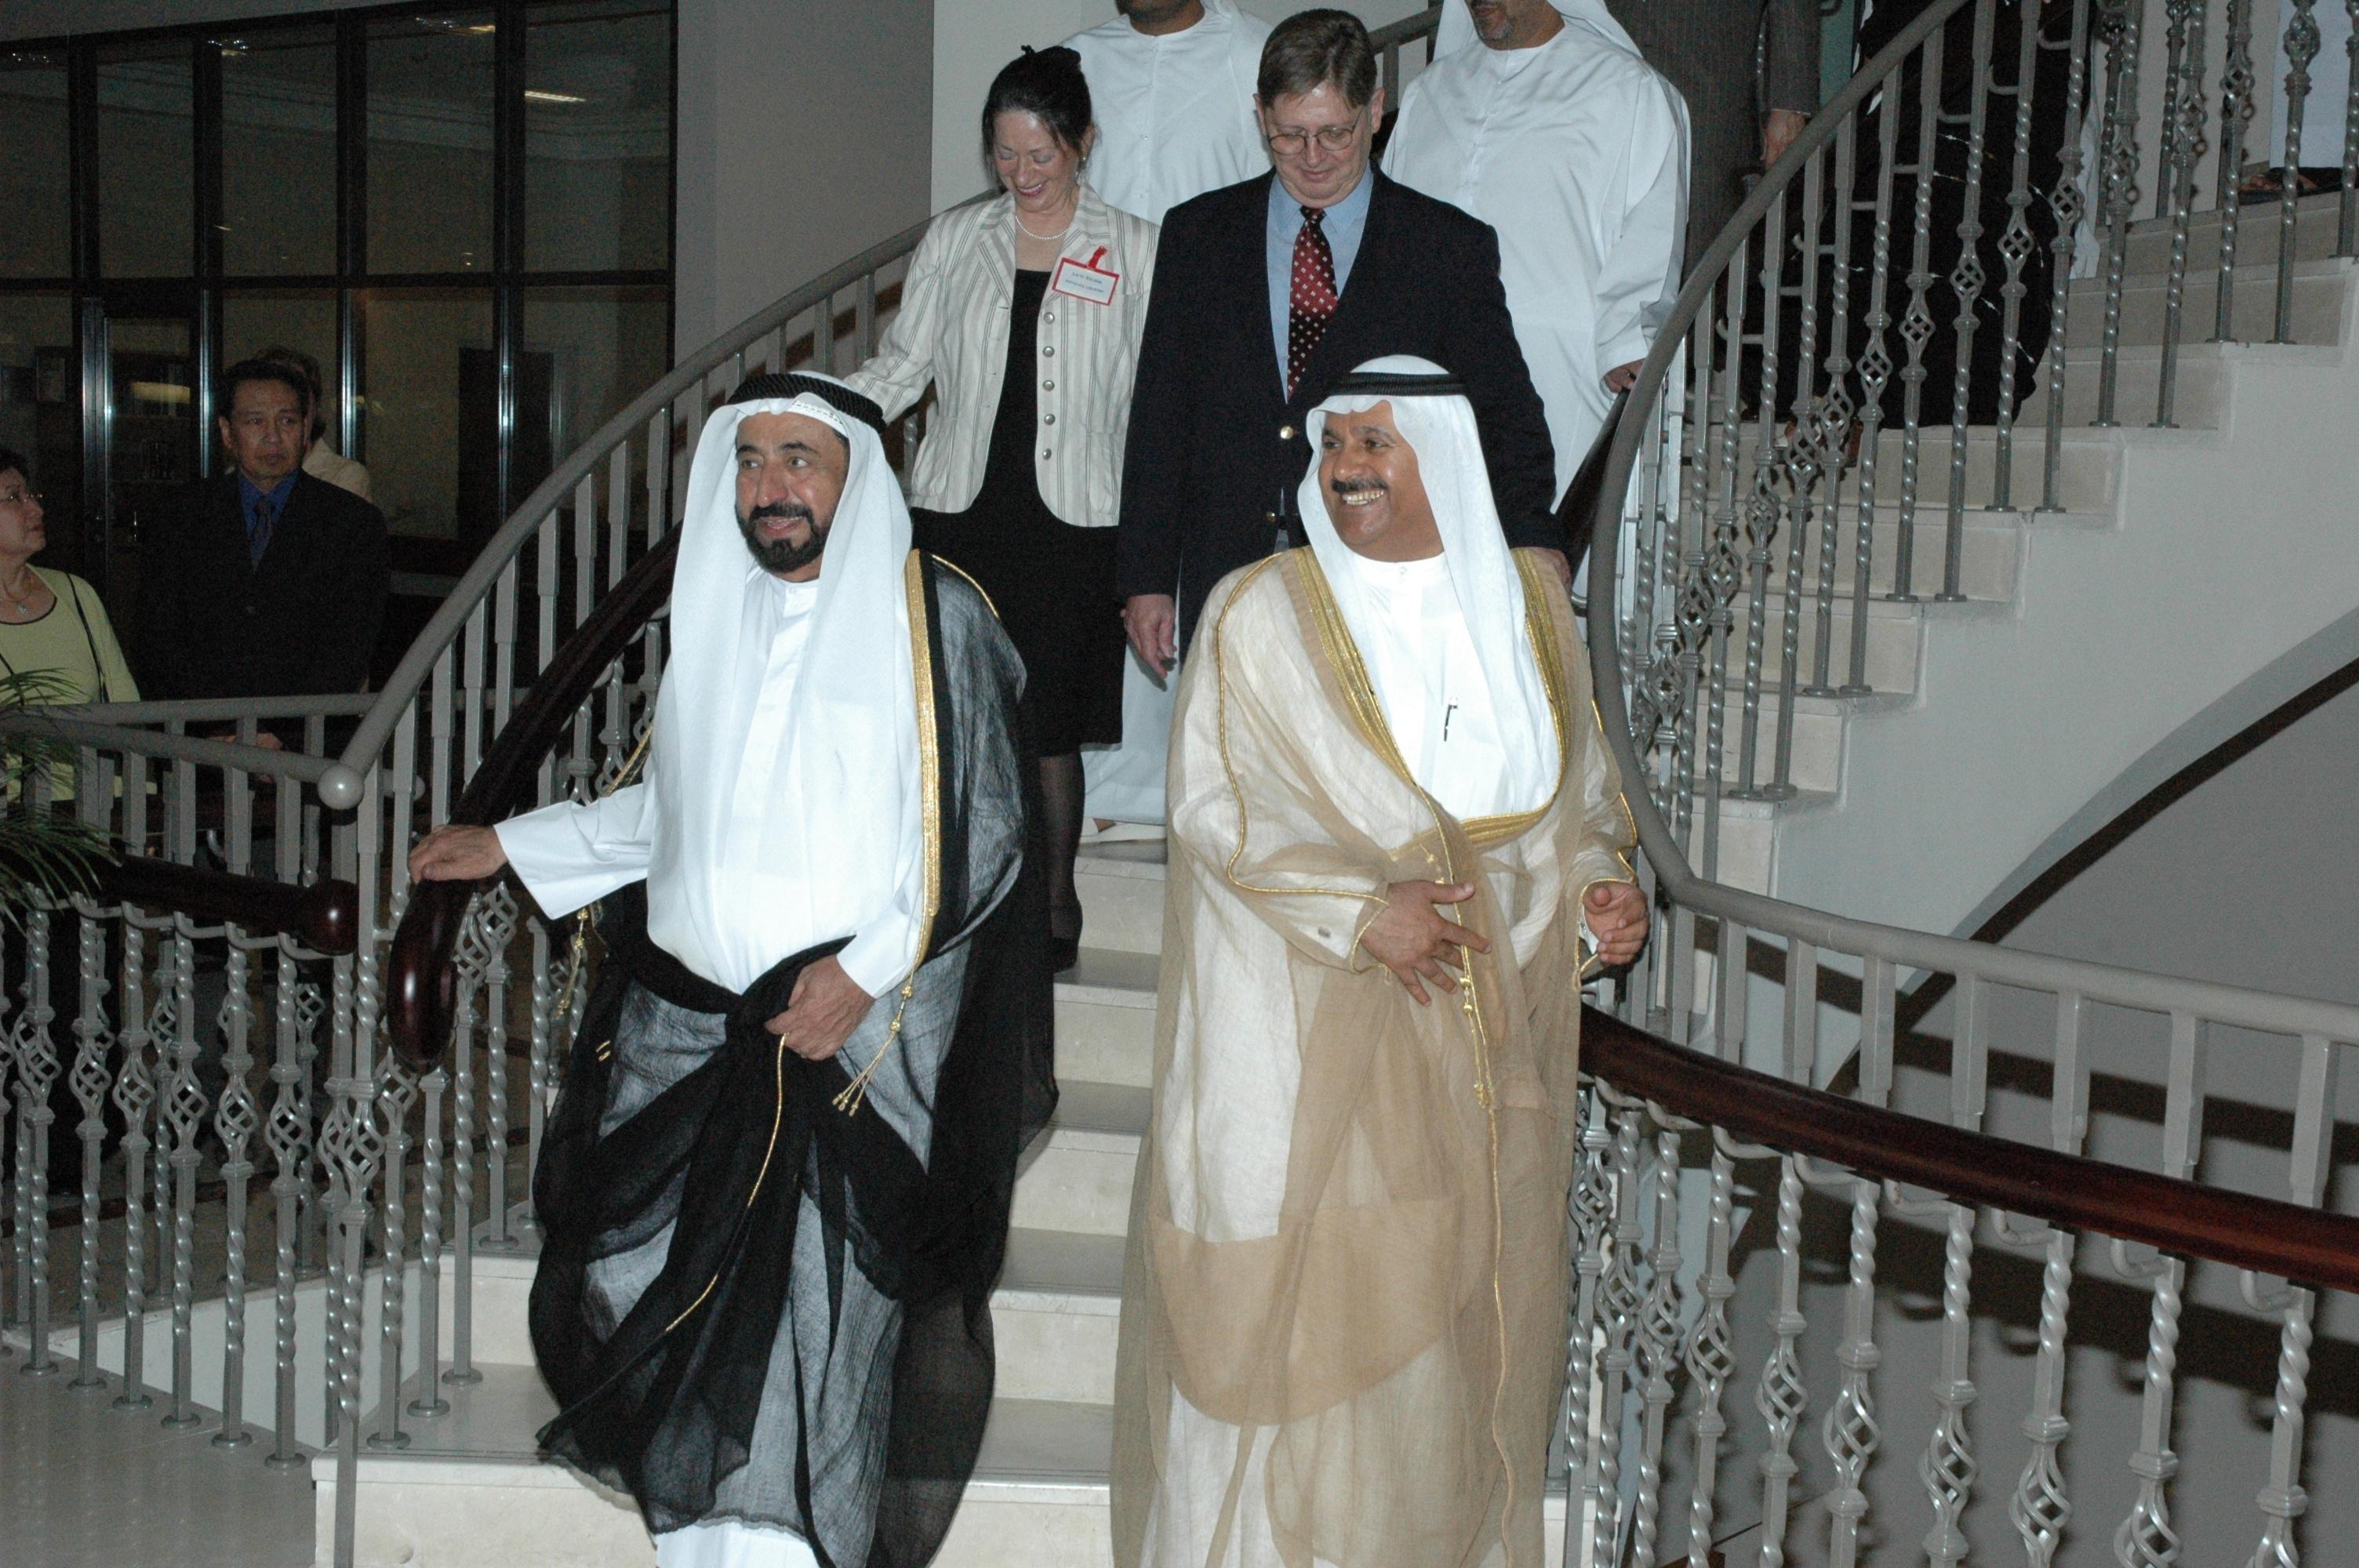 American_University_of_Sharjah_Library_15.jpg